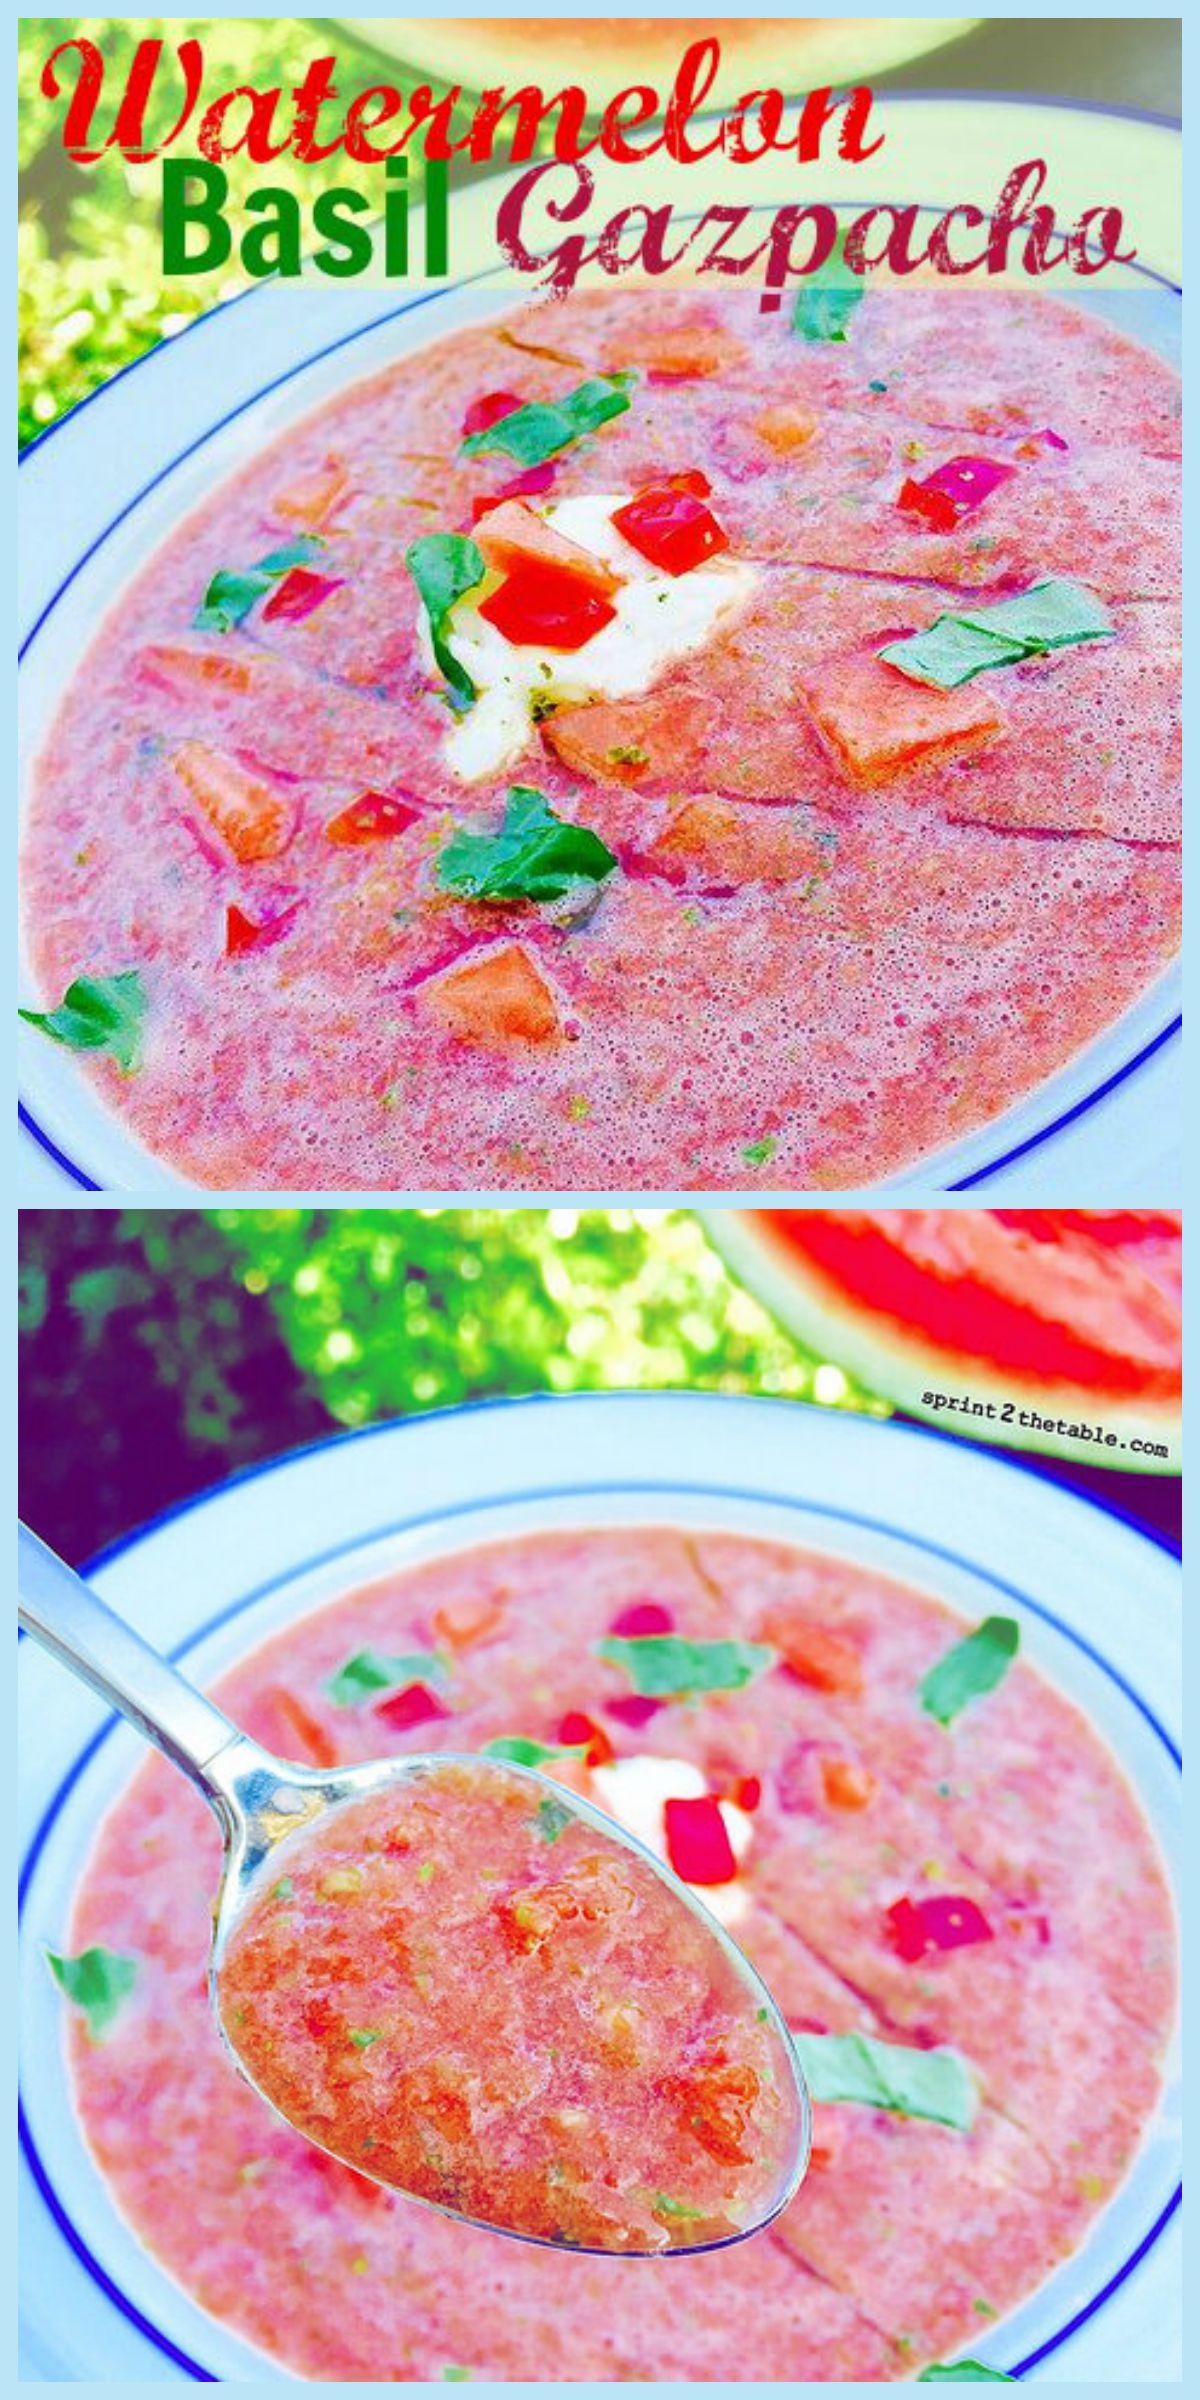 Watermelon Basil Gazpacho recipe